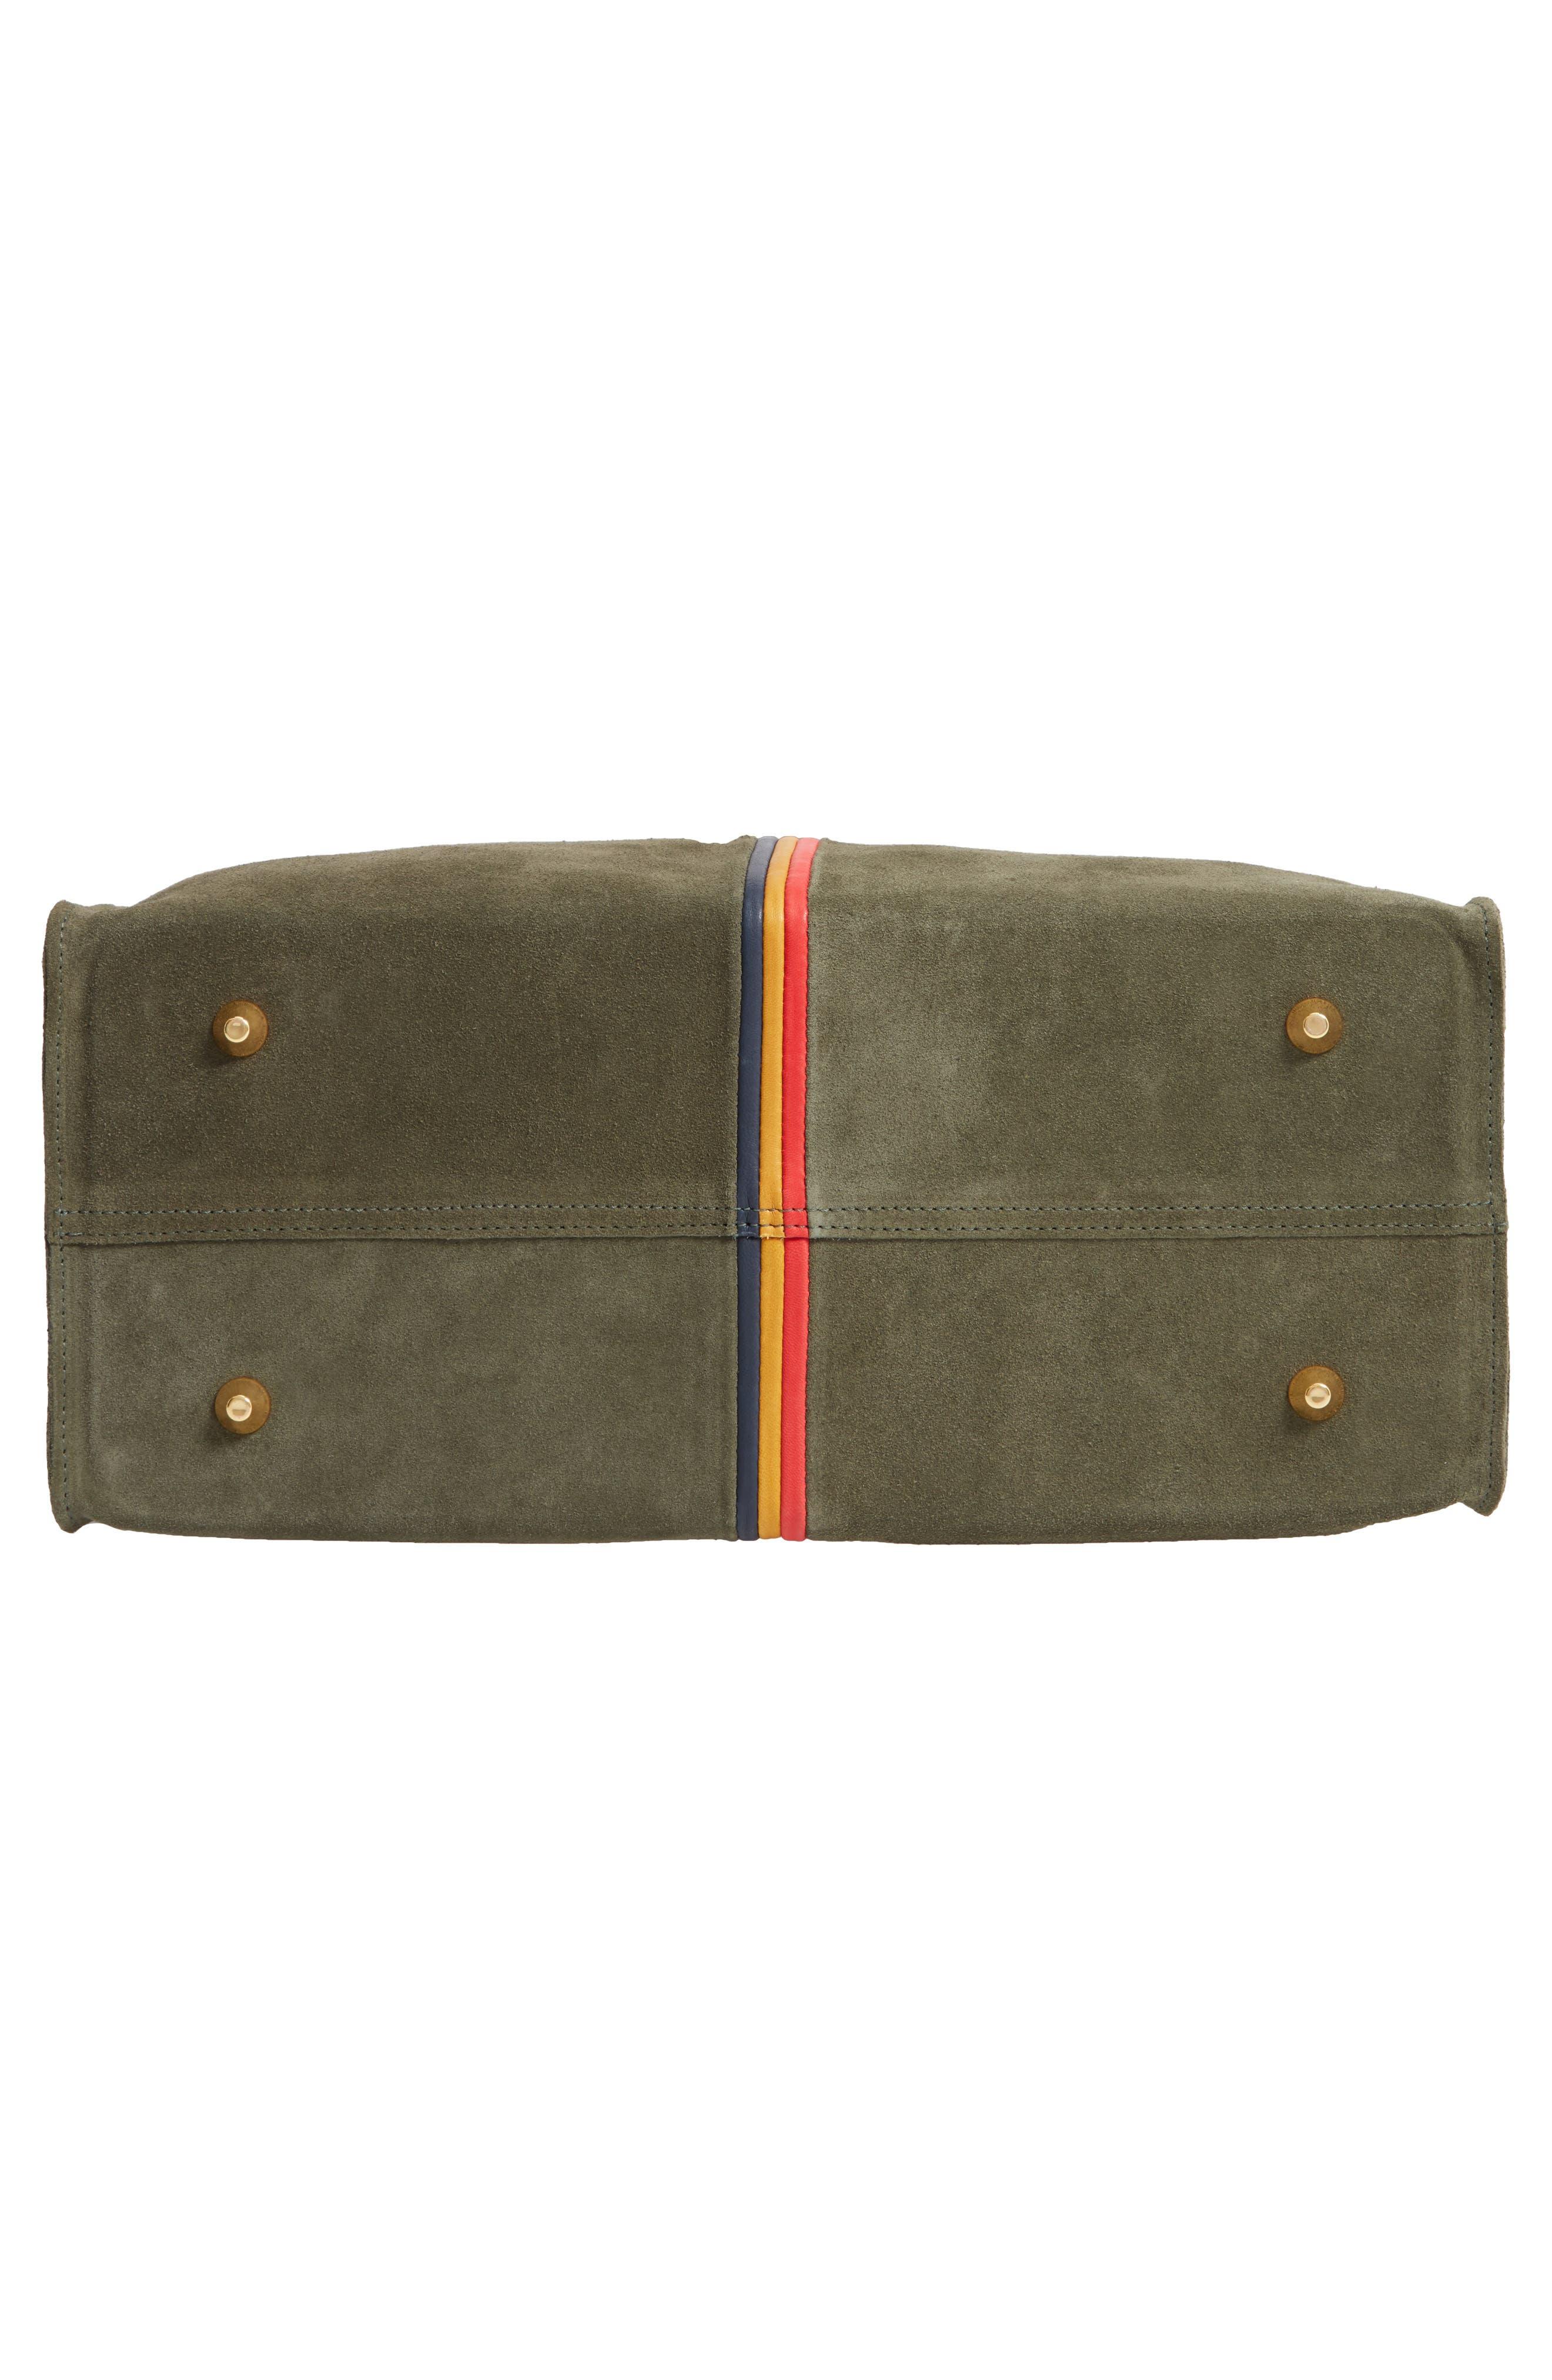 Simple Stripe Nubuck Tote,                             Alternate thumbnail 6, color,                             ARMY SUEDE STRIPE